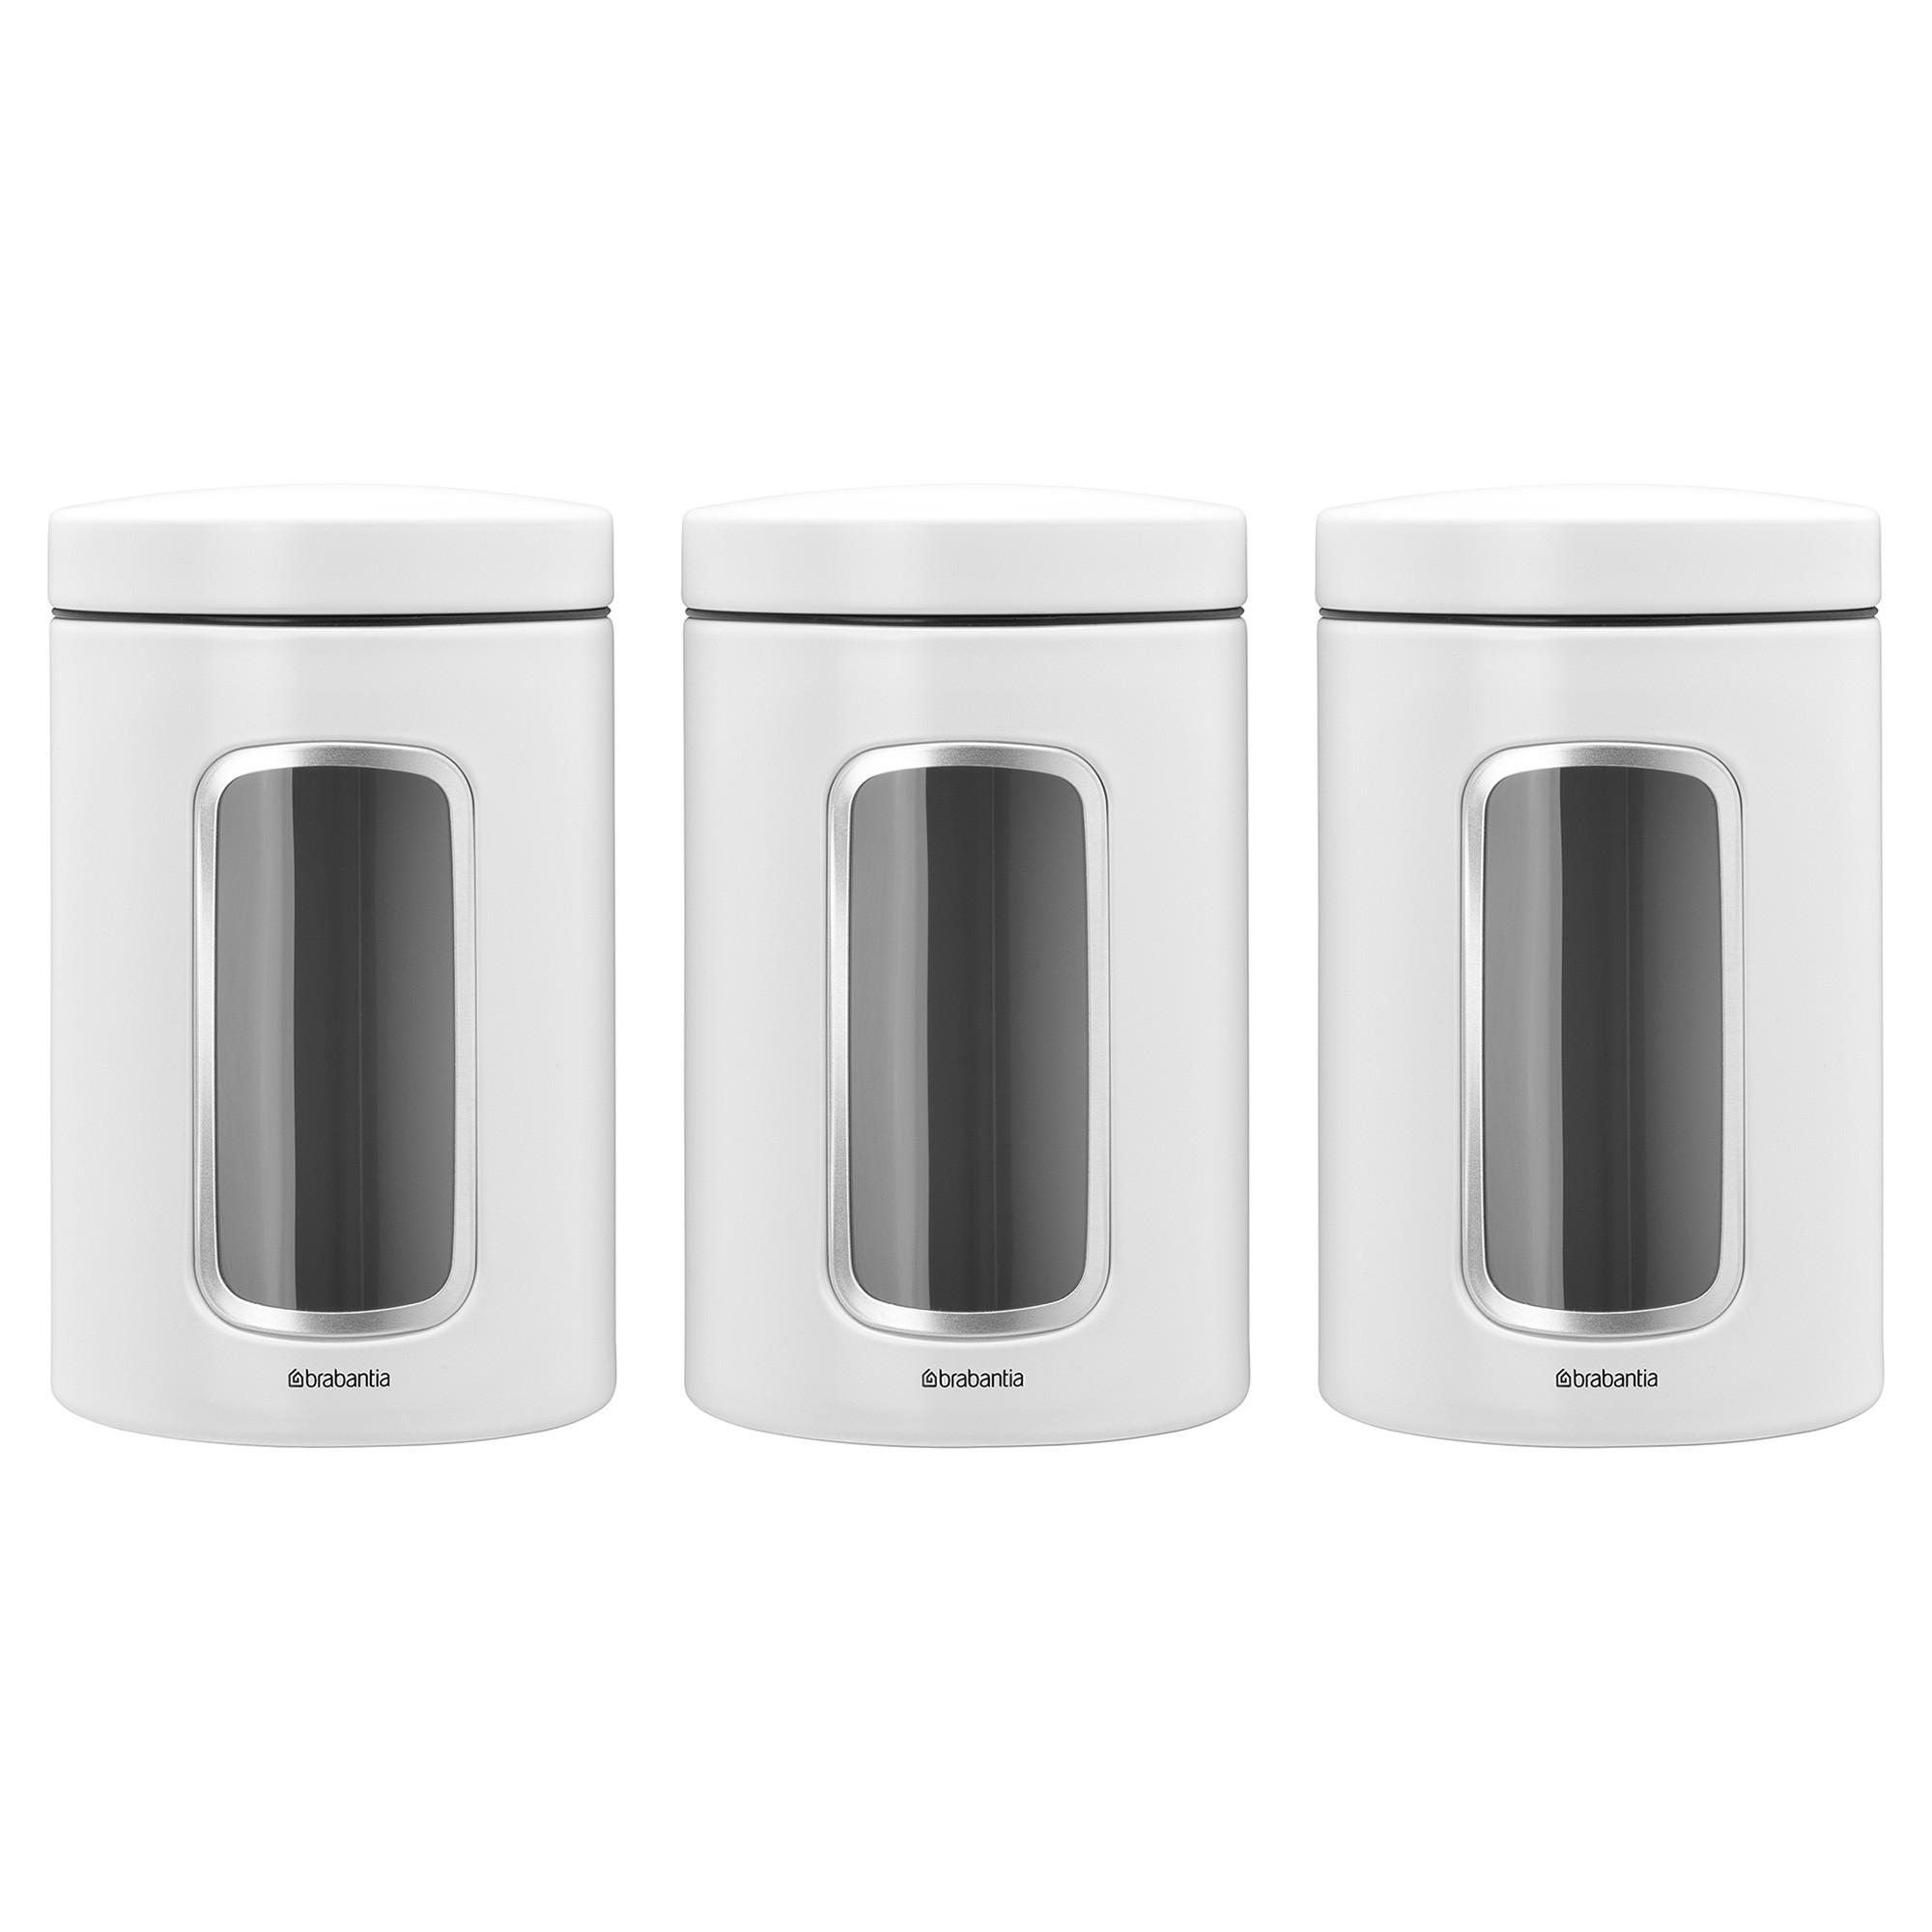 Brabantia 3 Piece Window Storage Canister Set, 1.4 Litre, White